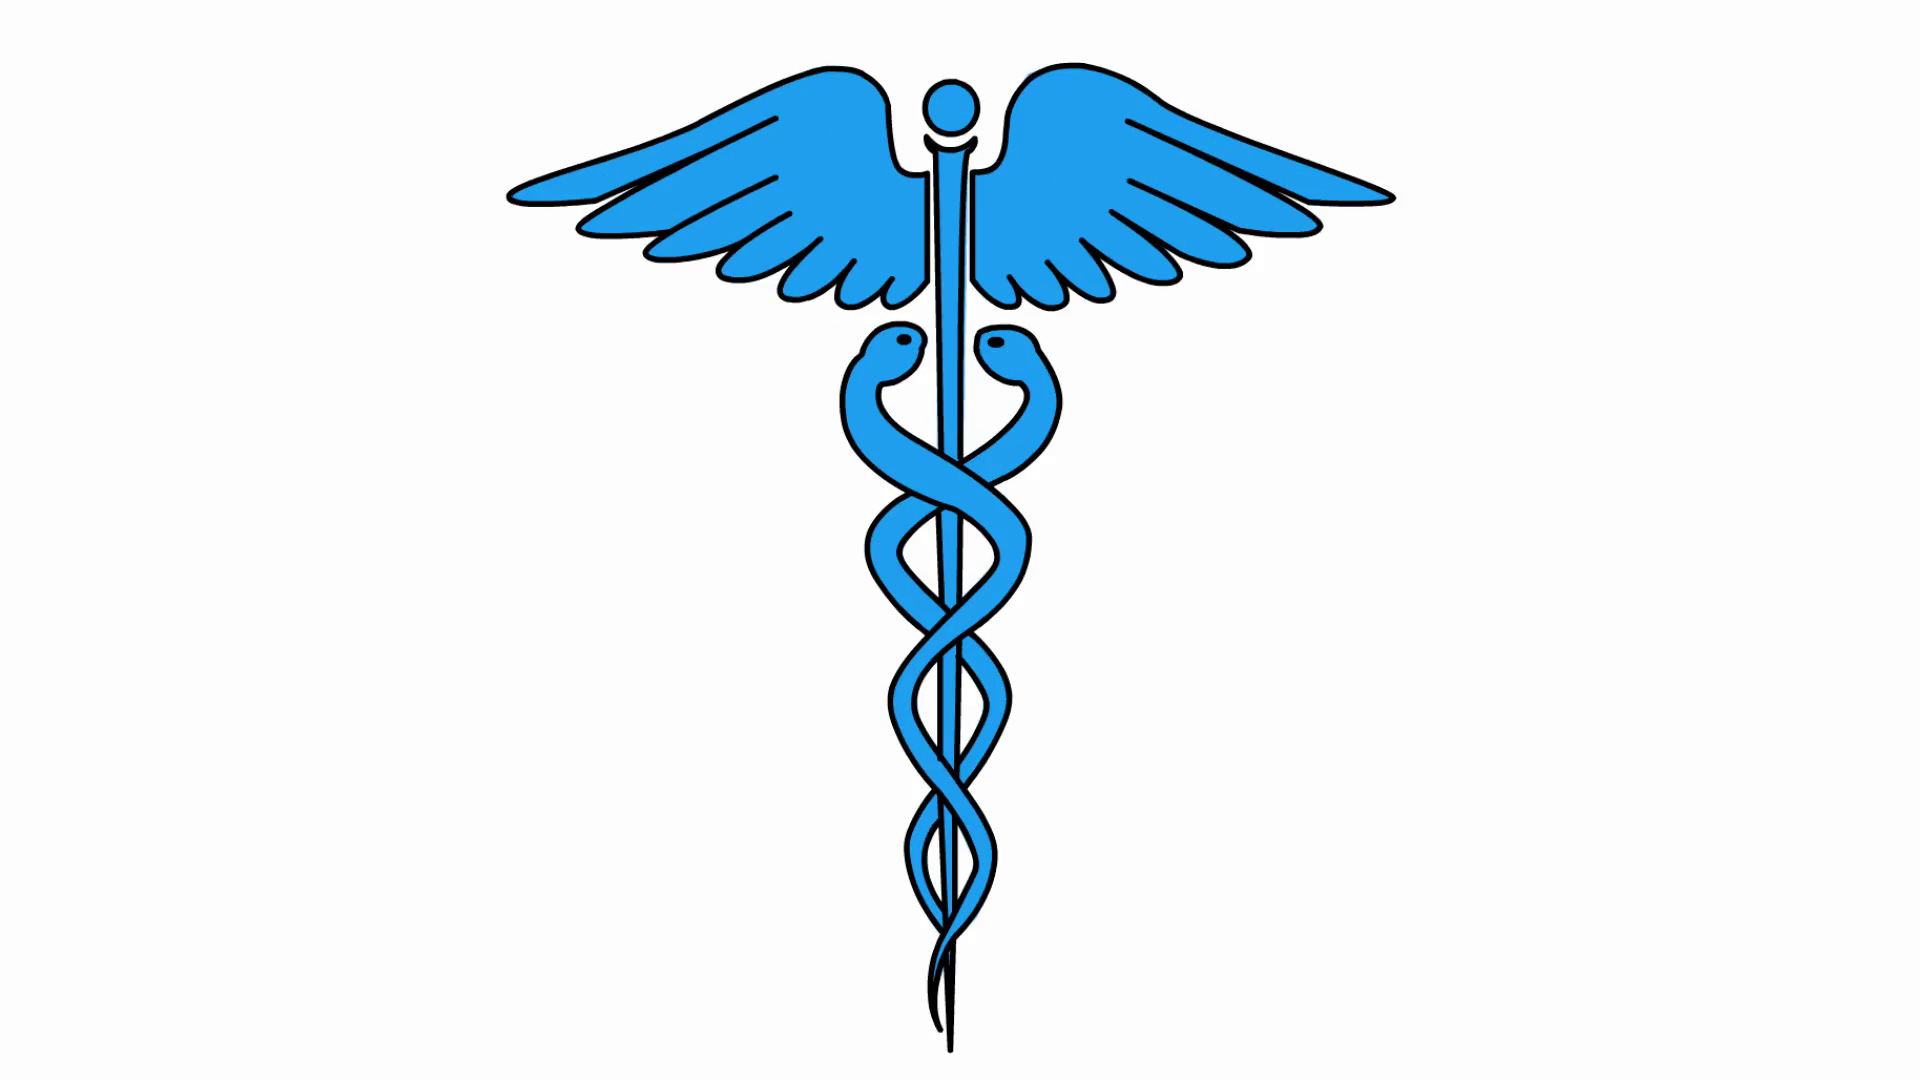 1920x1080 Caduceus Medical Symbol Medical Sketch Illustration Hand Drawn